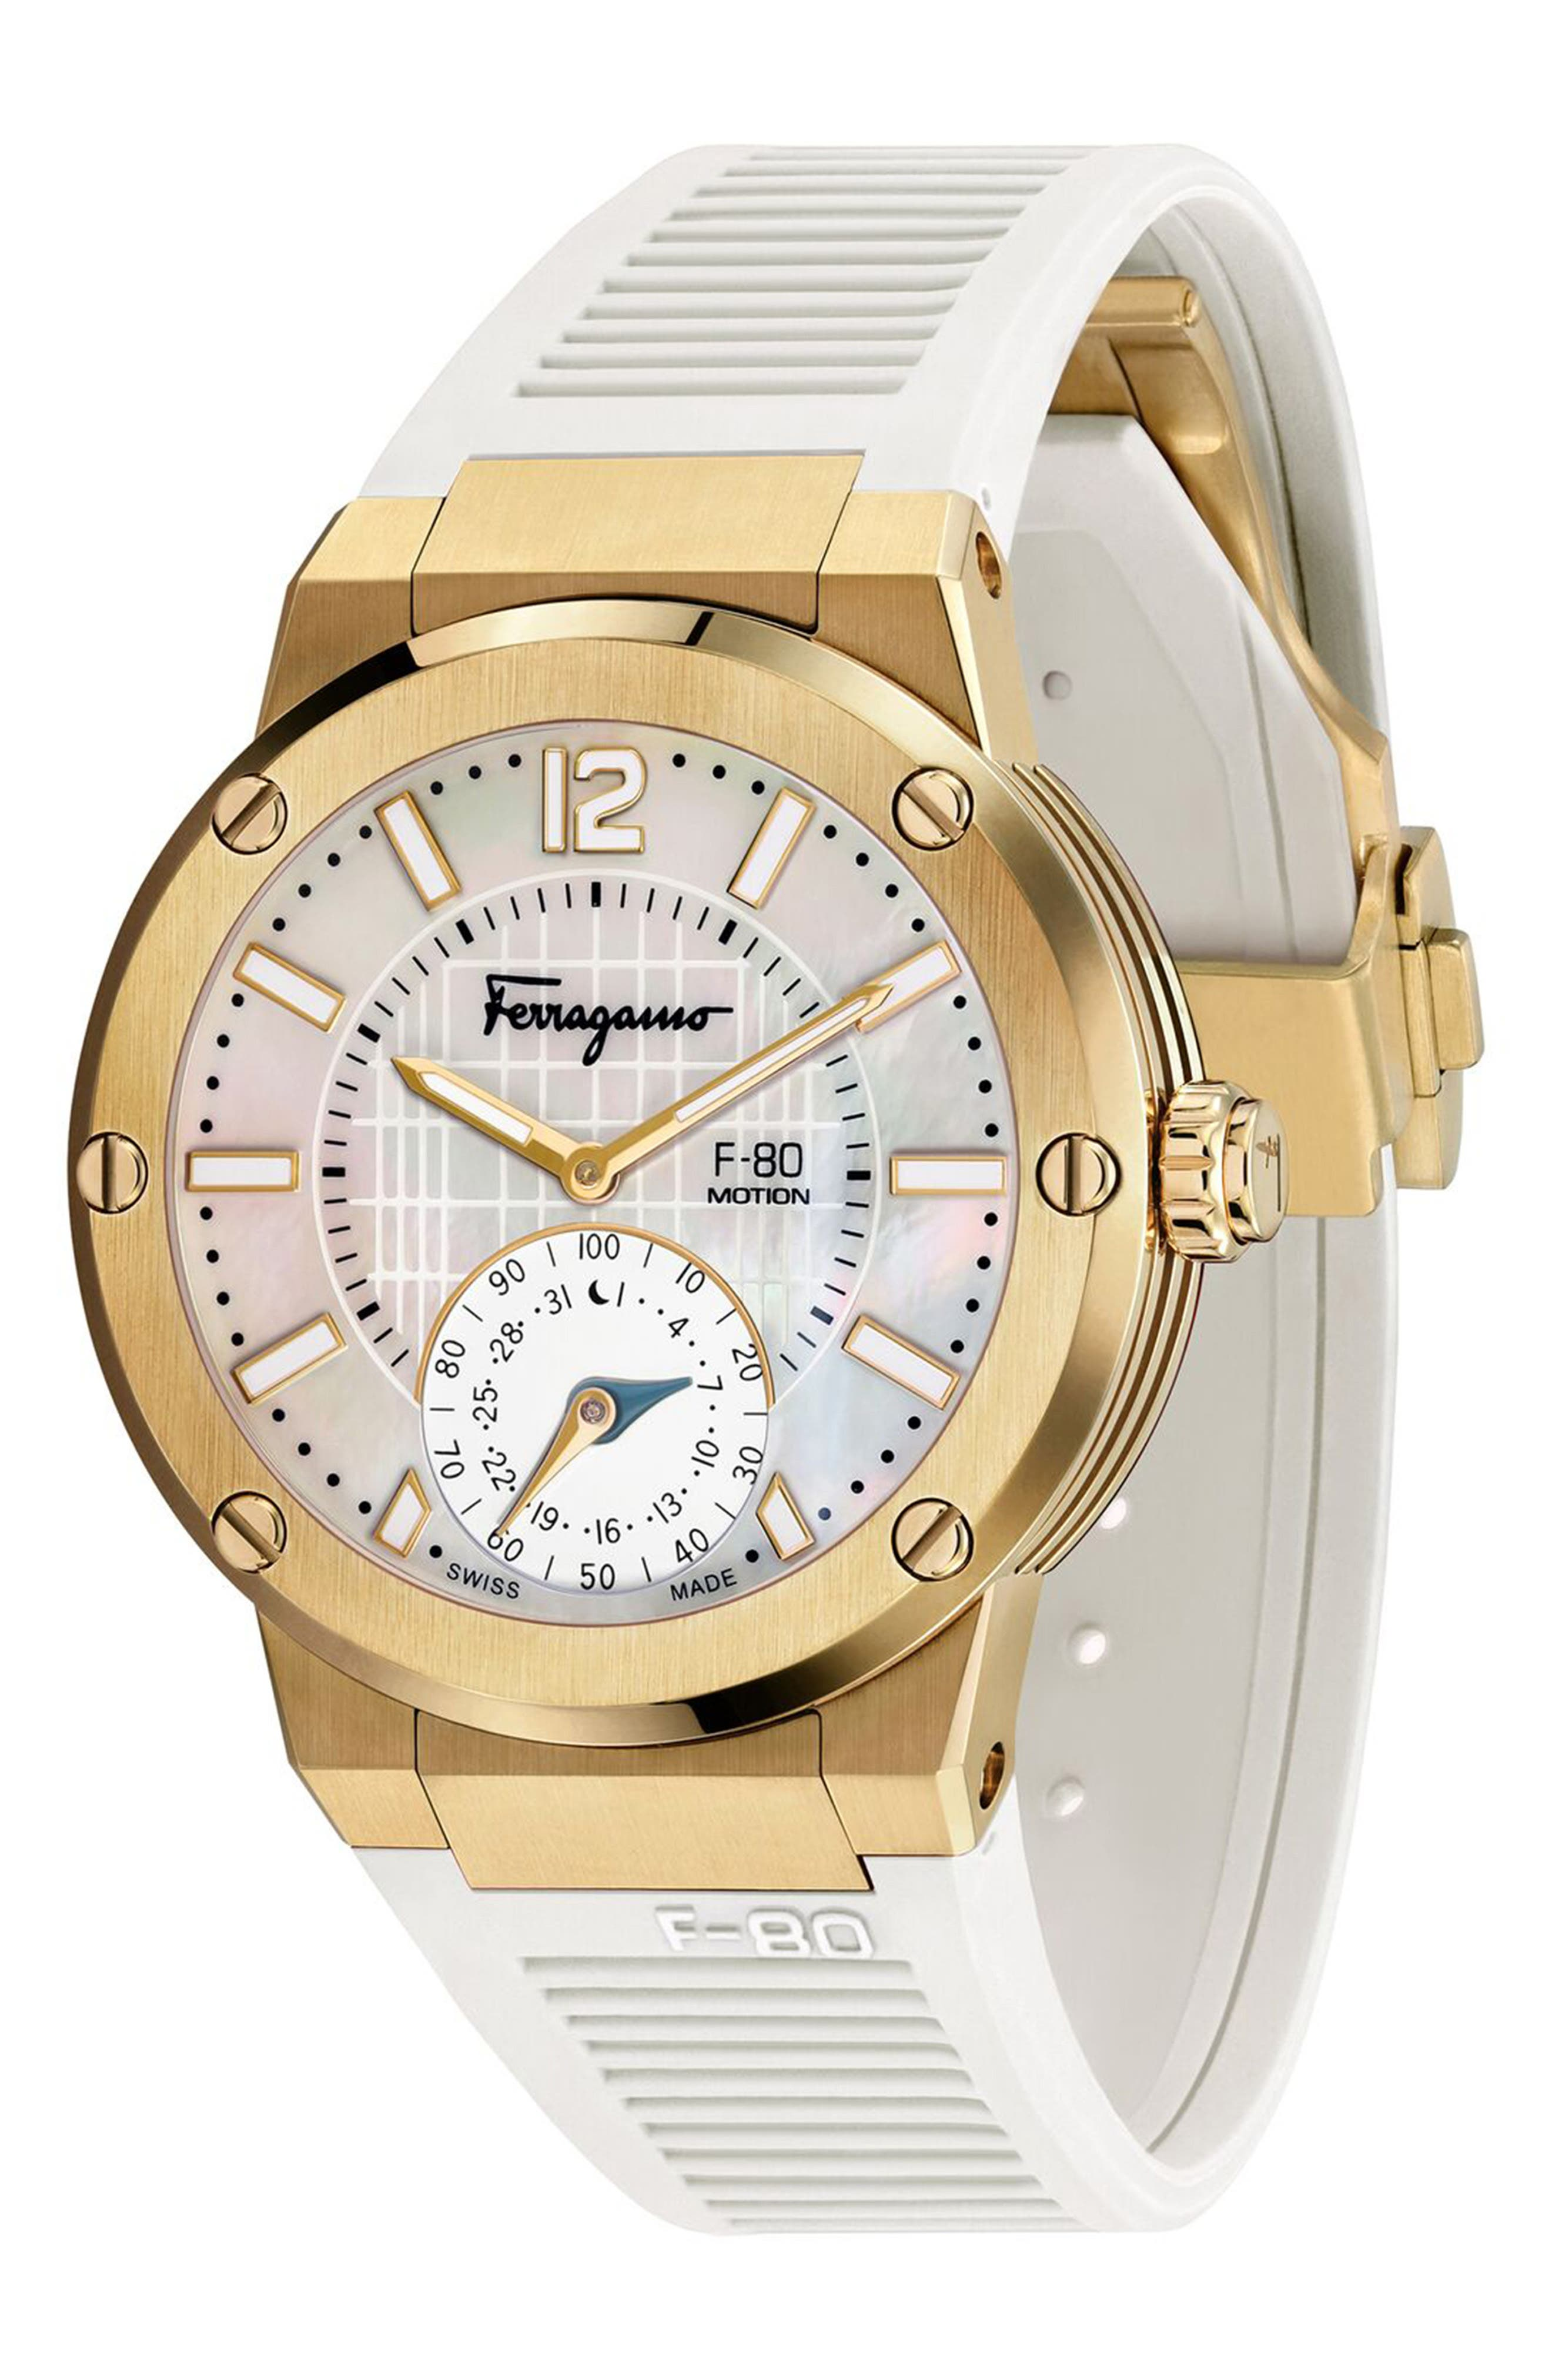 SALVATORE FERRAGAMO, F-80 Motion Rubber Strap Smart Watch, 44mm, Main thumbnail 1, color, WHITE/ MOP/ GOLD